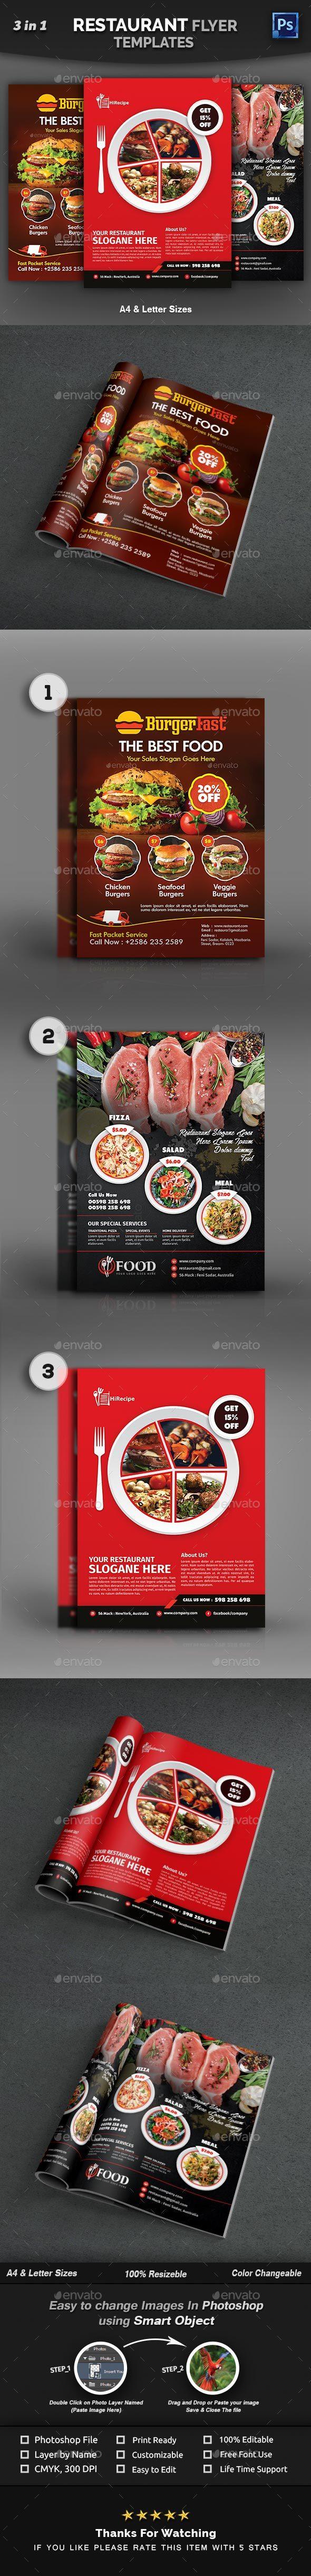 GraphicRiver Restaurant Flyer Burger Flyer Templates 21043342